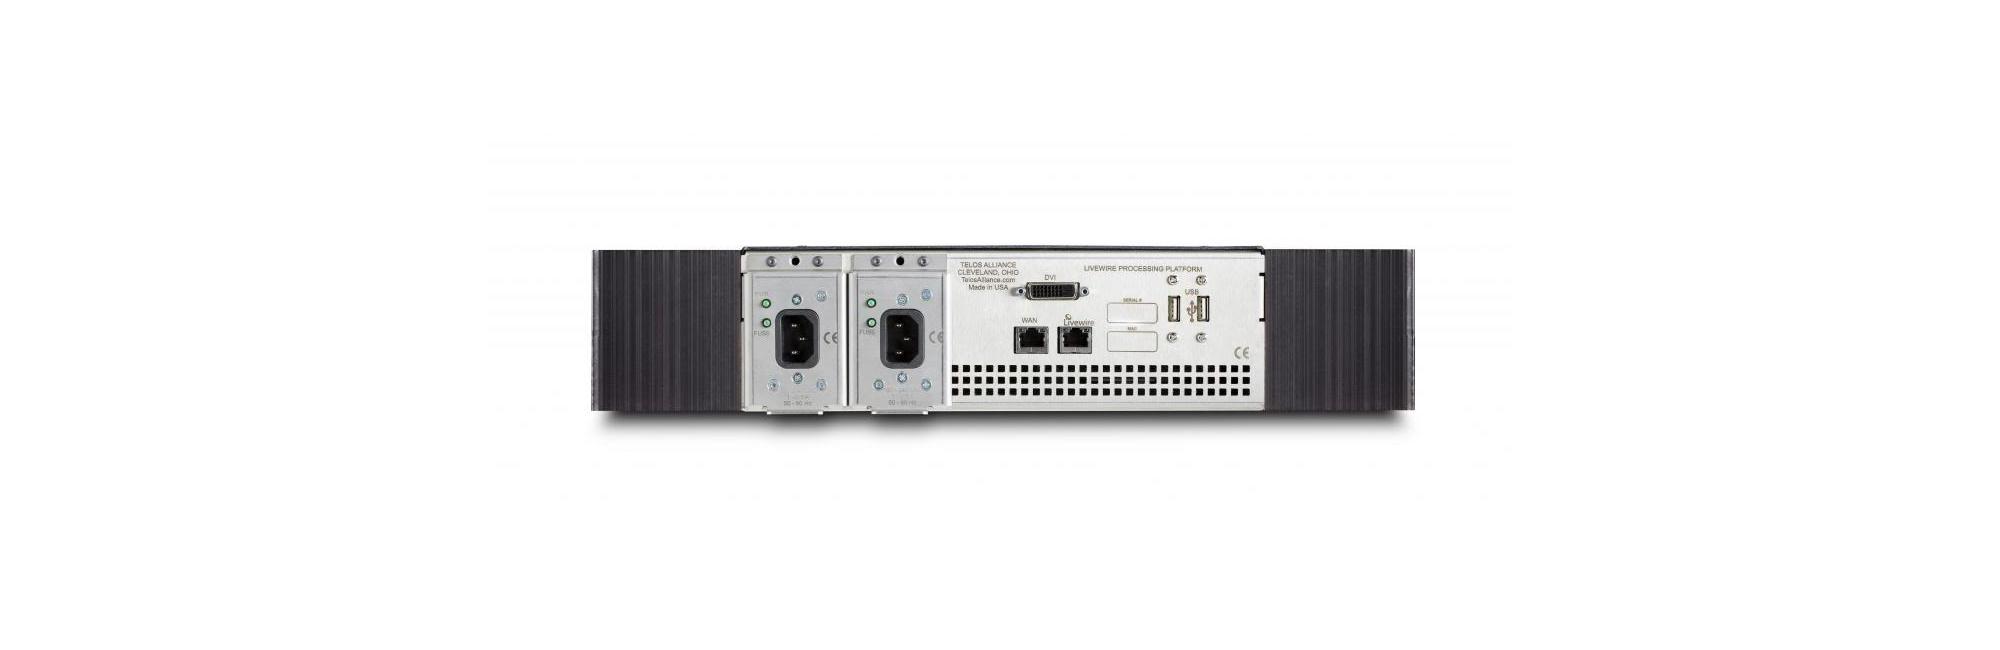 Zephyr iPort PLUS Telos System